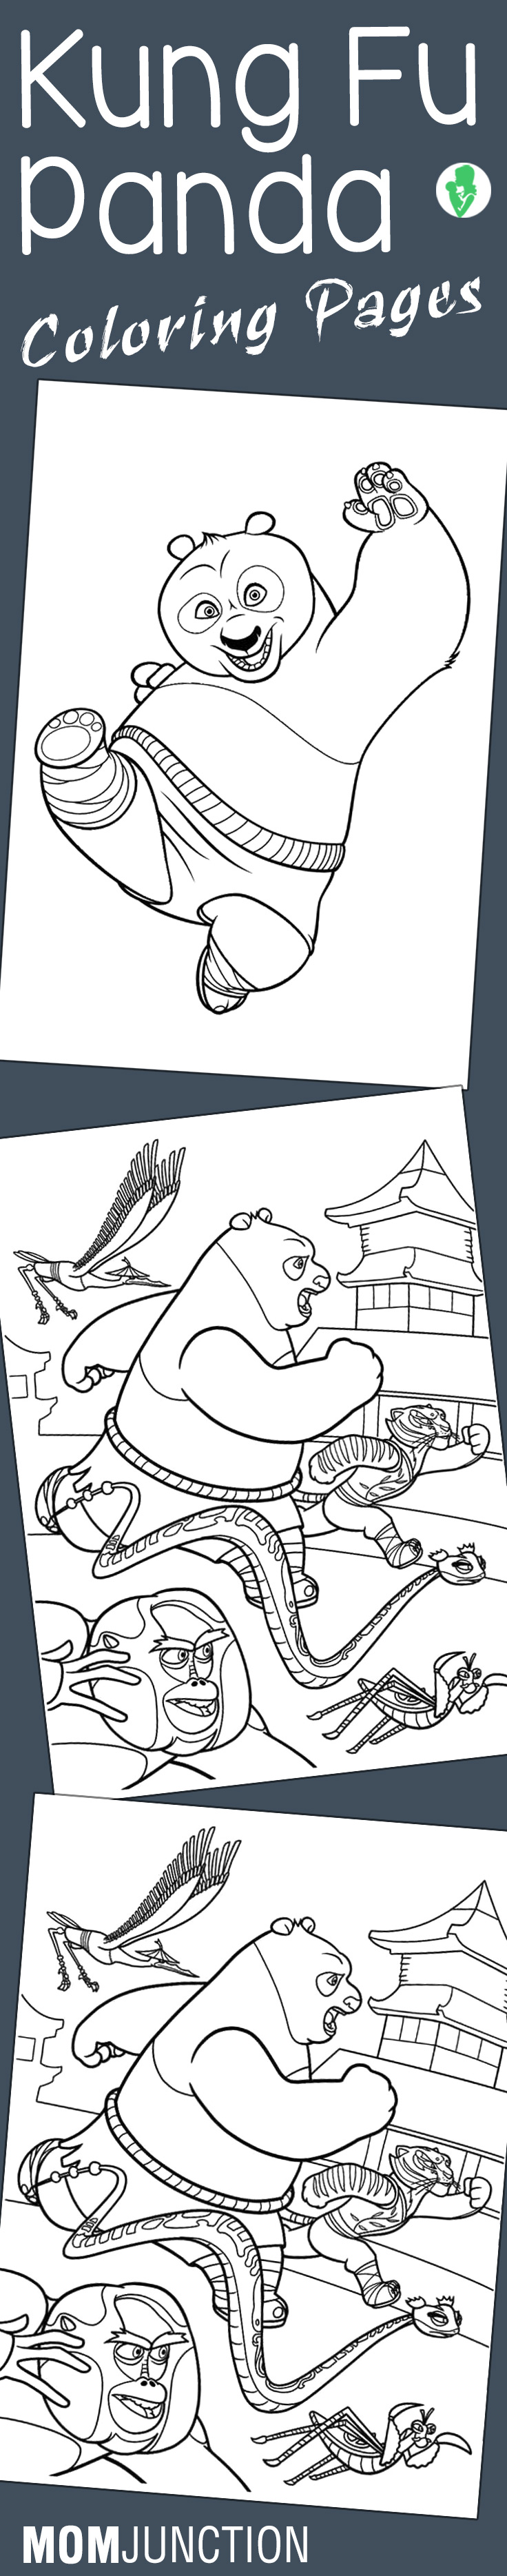 Printable karate coloring pages - Top 10 Free Printable Kung Fu Panda Coloring Pages Online